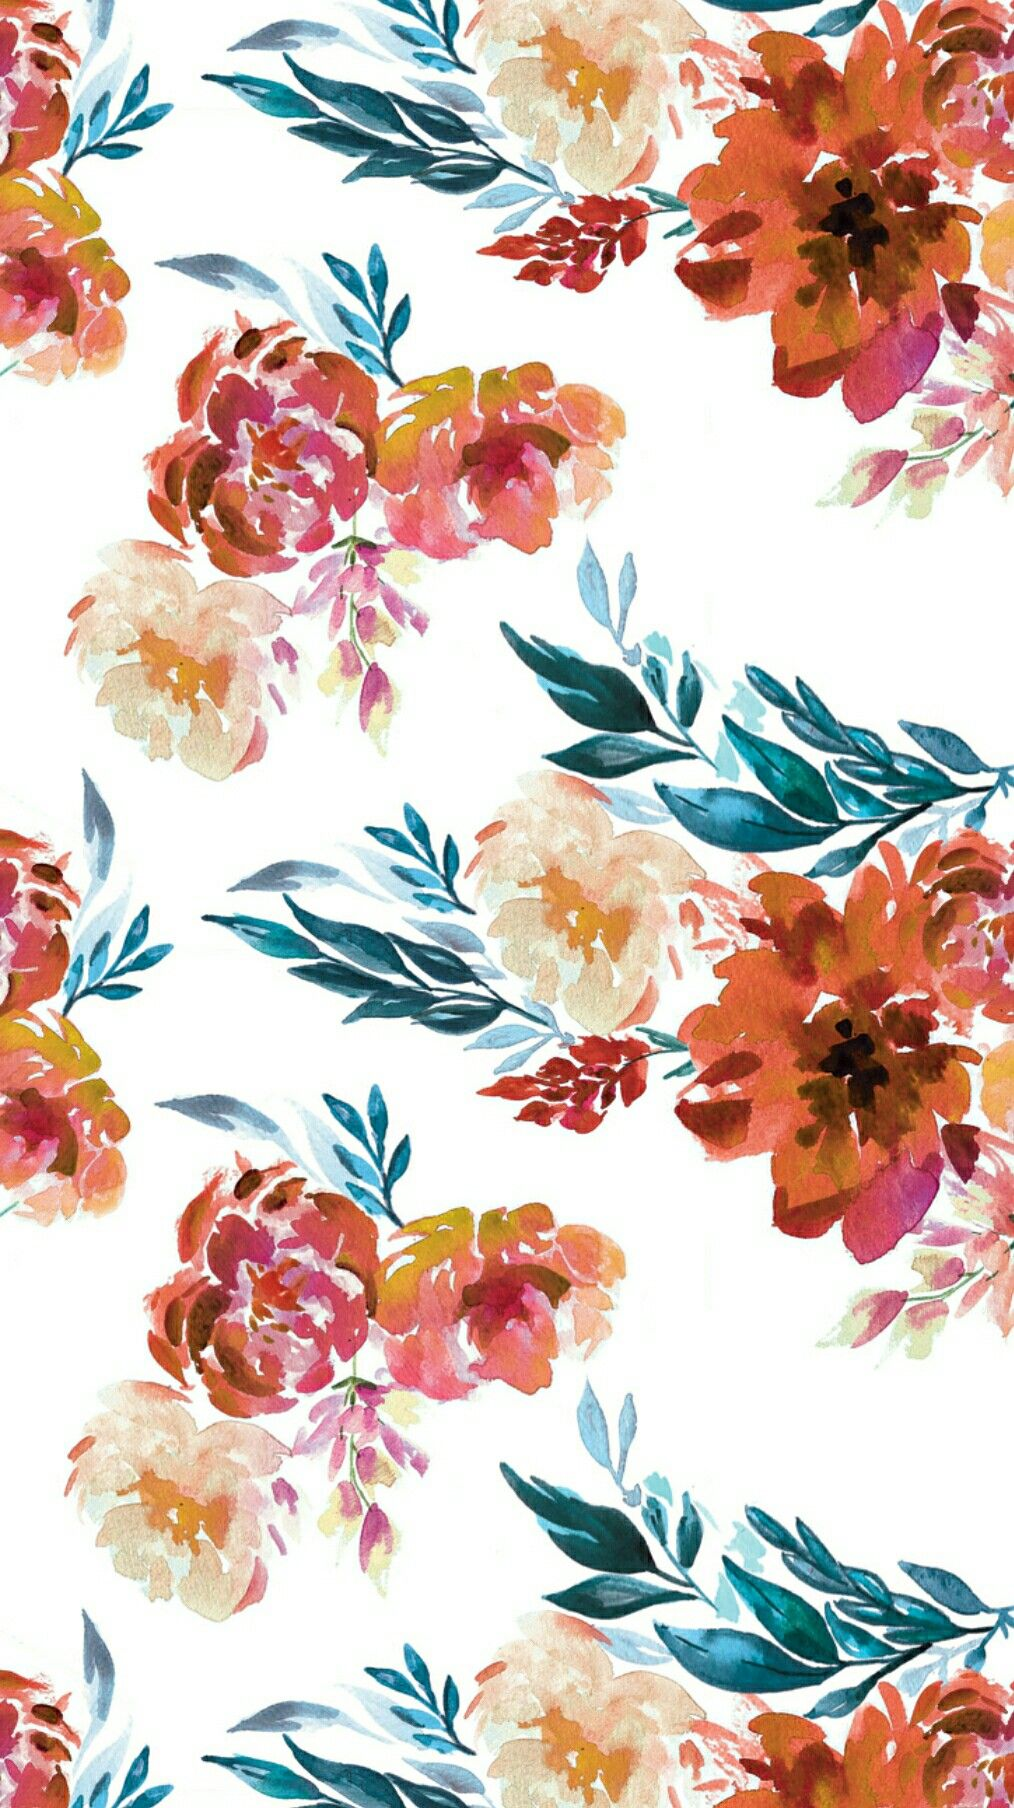 Wallpaper Iphone Floral Wallpaper Floral Wallpaper Iphone Iphone Wallpaper Vintage Quotes